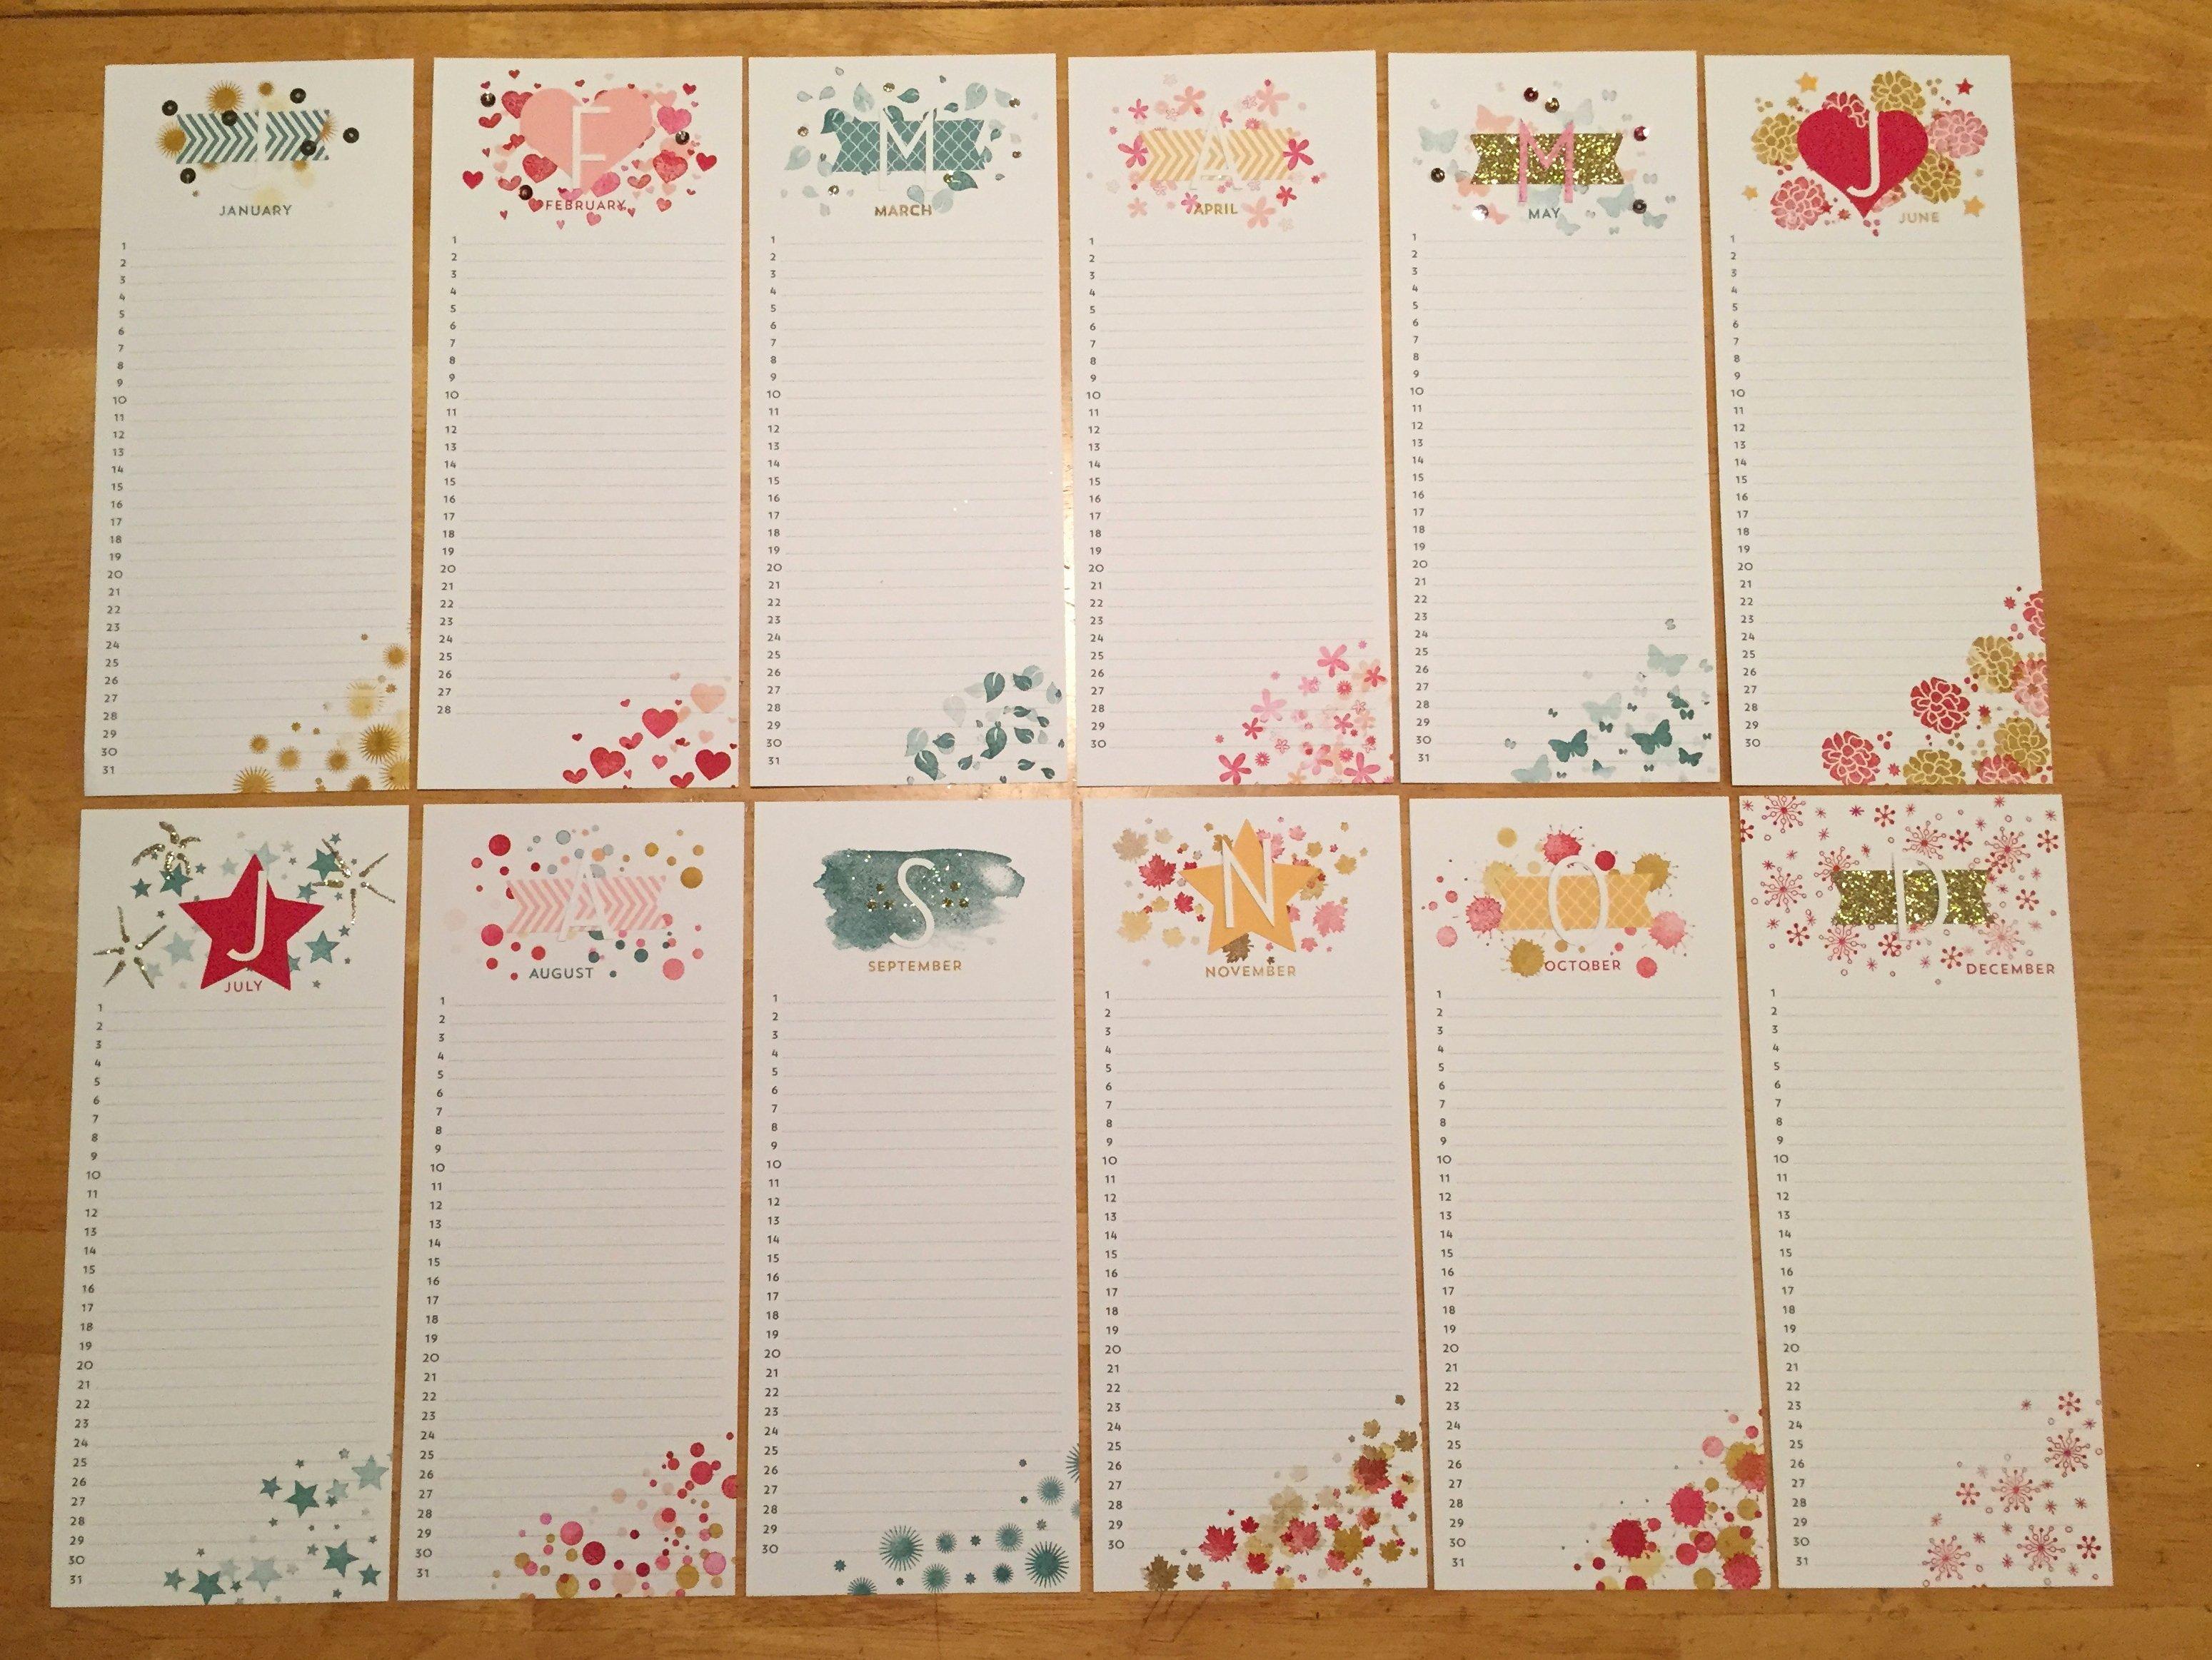 Free Printable Perpetual Calendar New Perpetual Birthday Calendar Project Kit – Finders Keepers